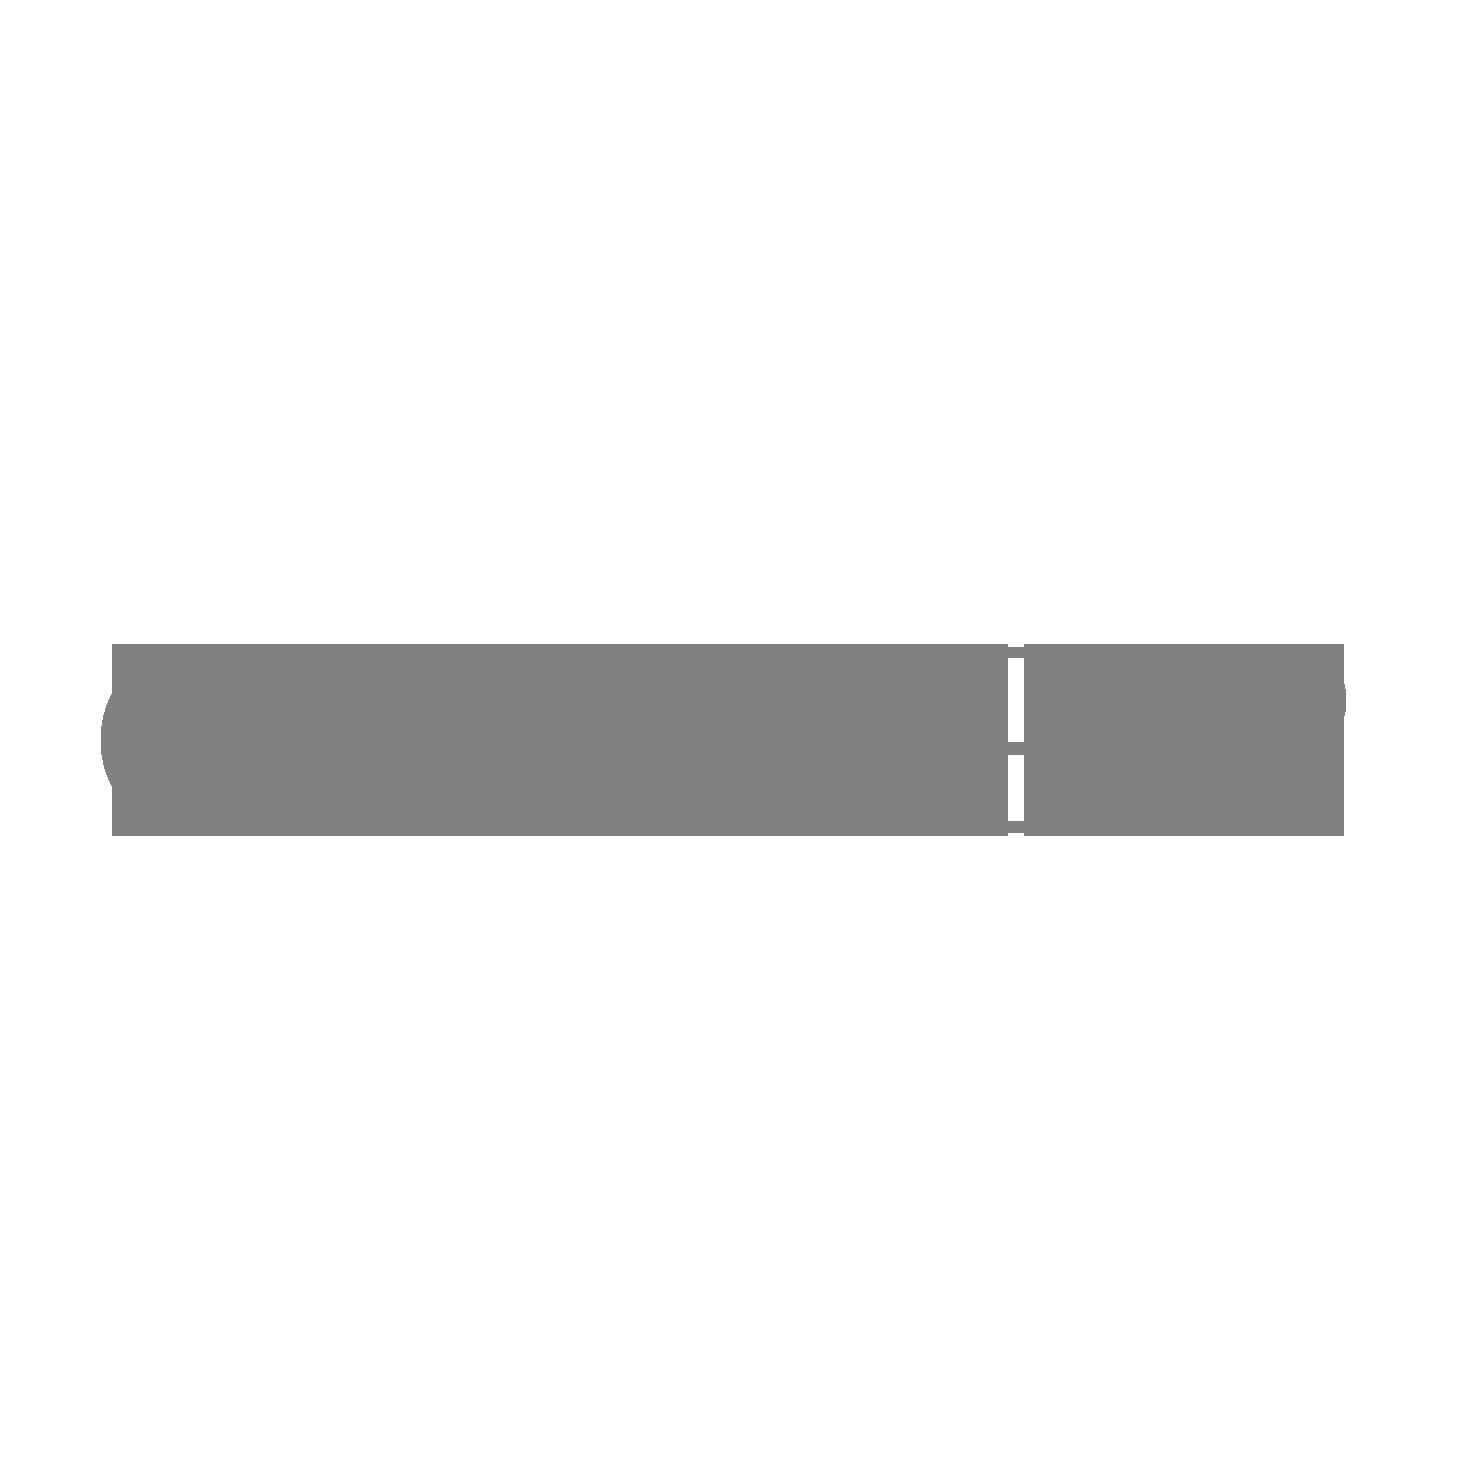 GoldSheep_001.png